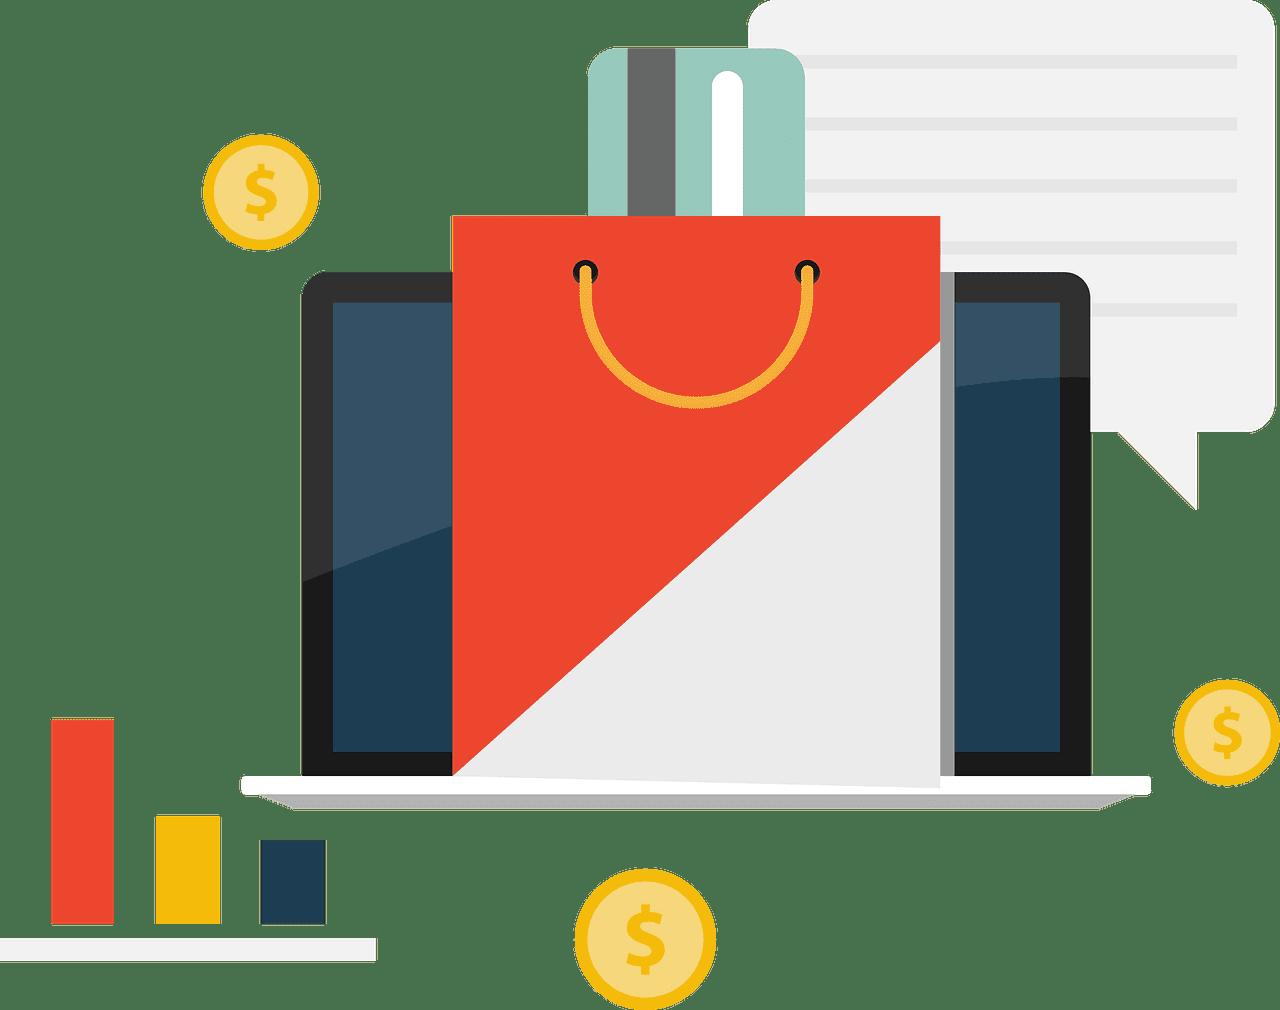 Online Shopping clipart transparent